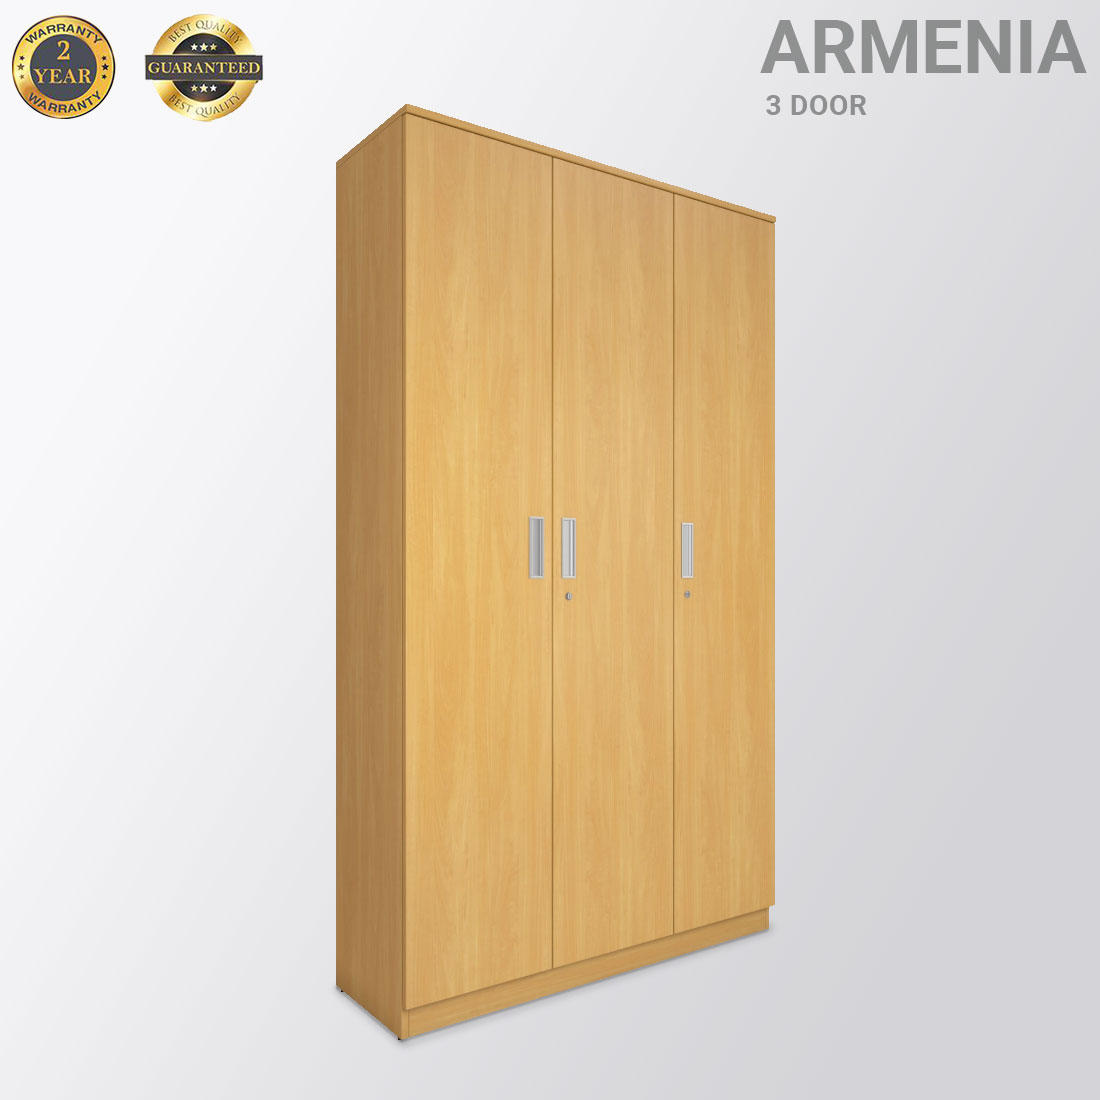 ARMENIA O  3 DOOR